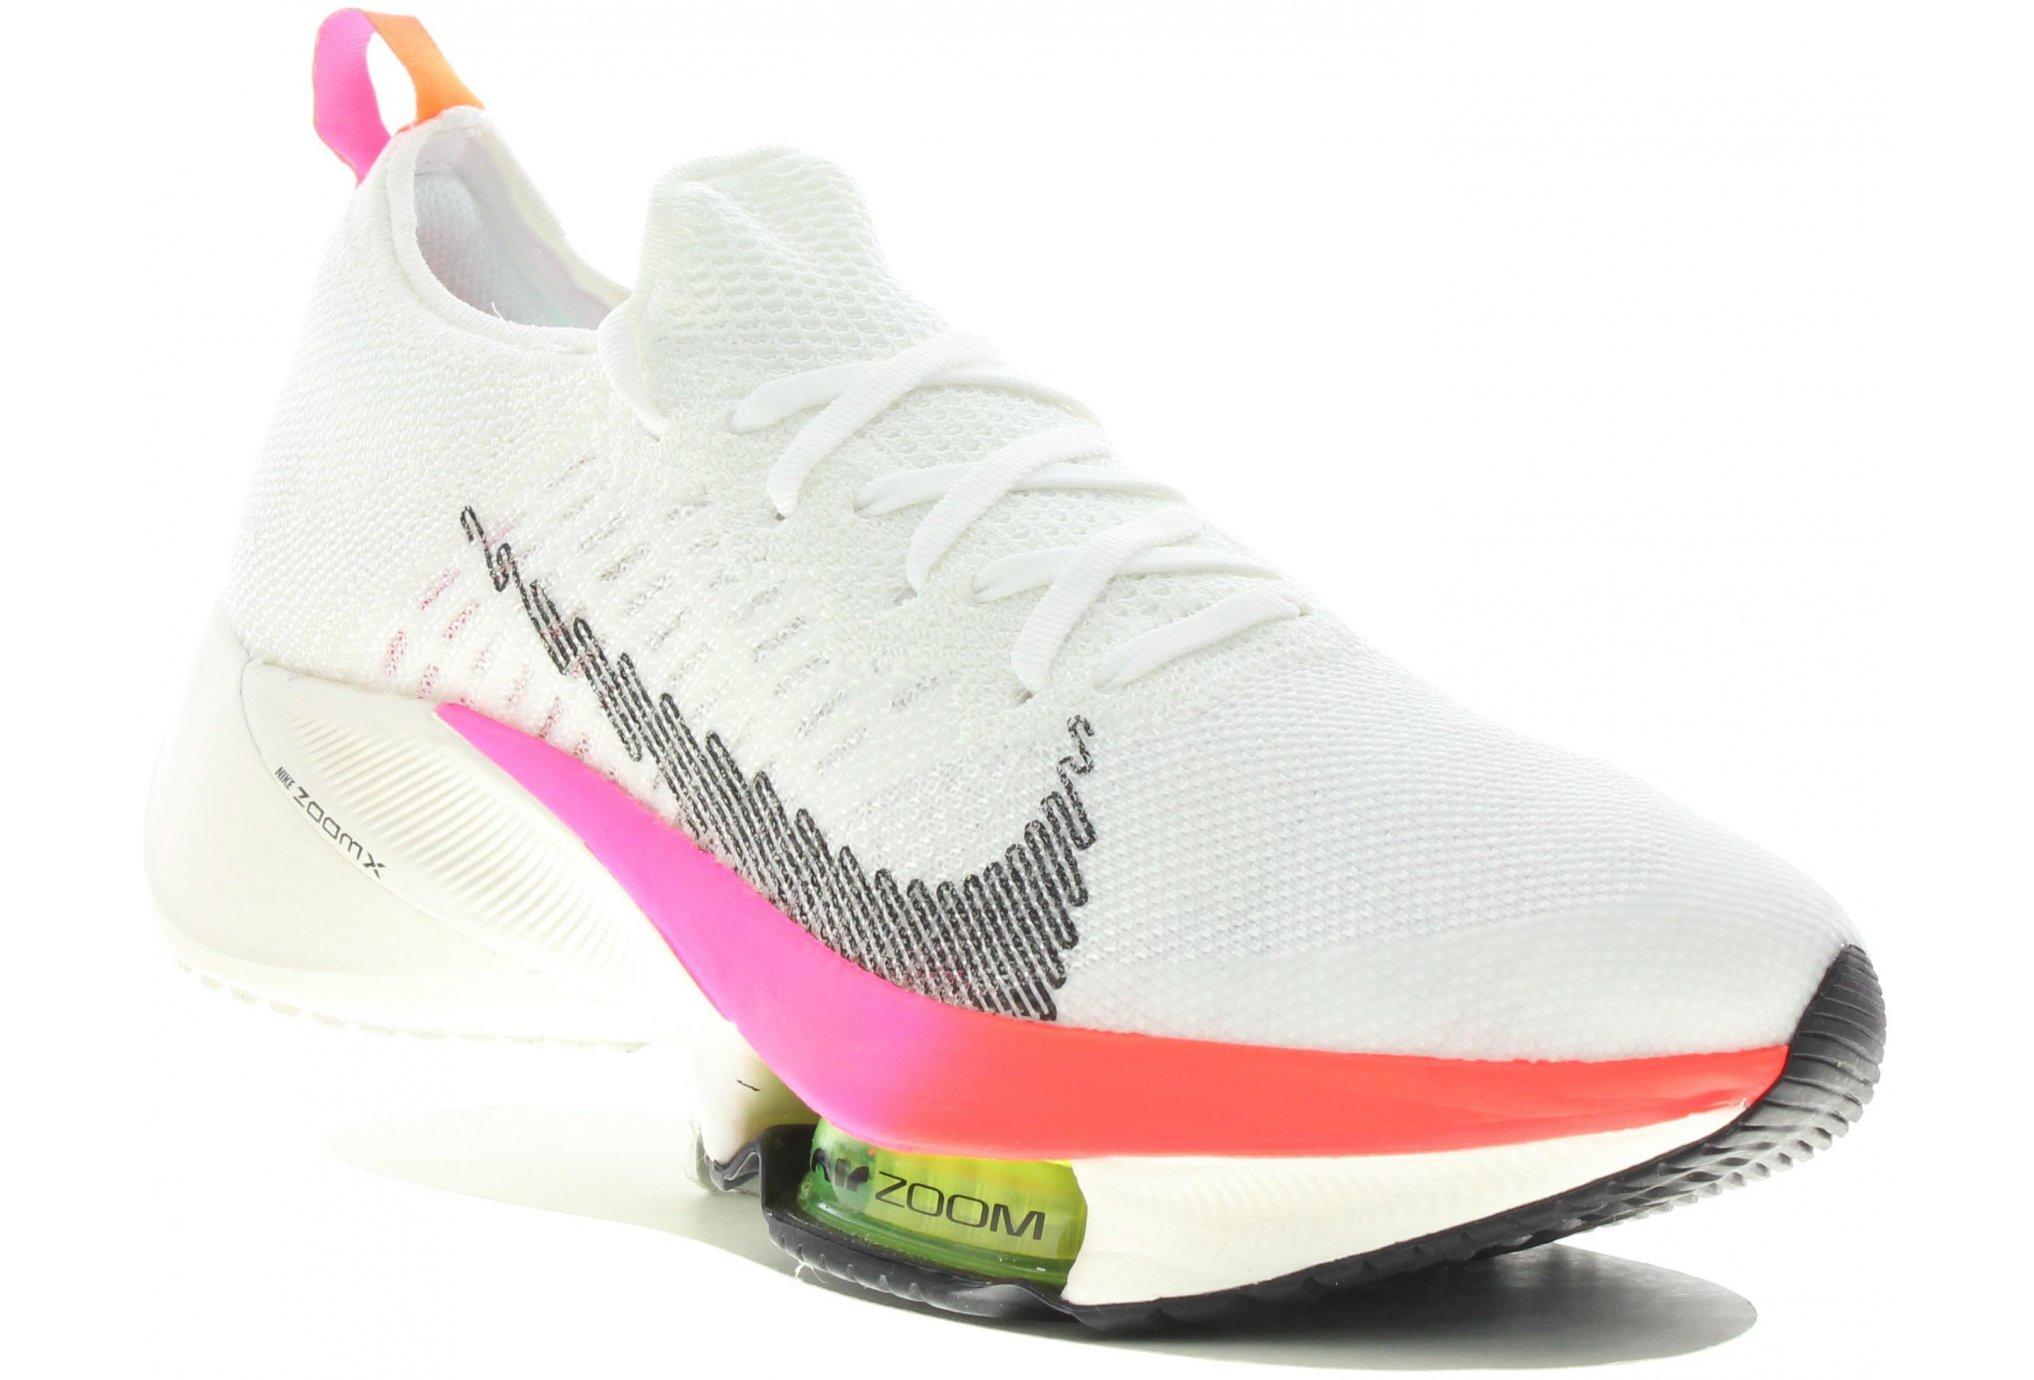 Nike Air Zoom Tempo Next% Rawdacious W Chaussures running femme